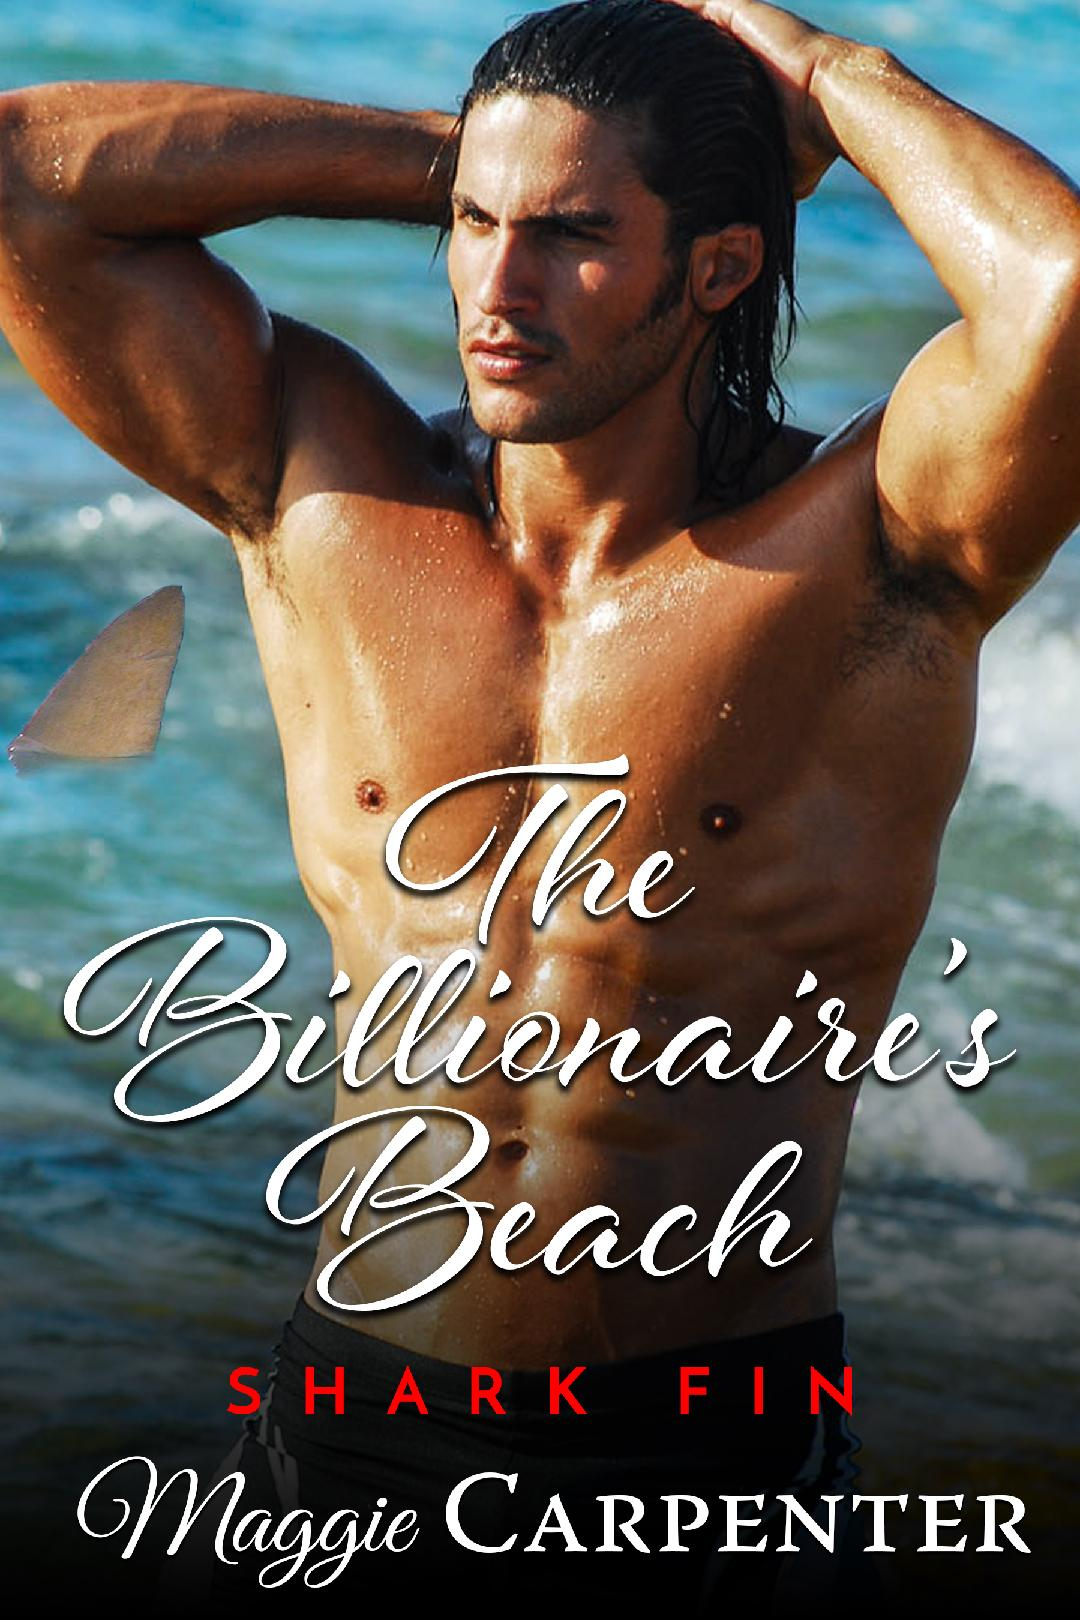 The Billionaire Beach: Shark Fin.